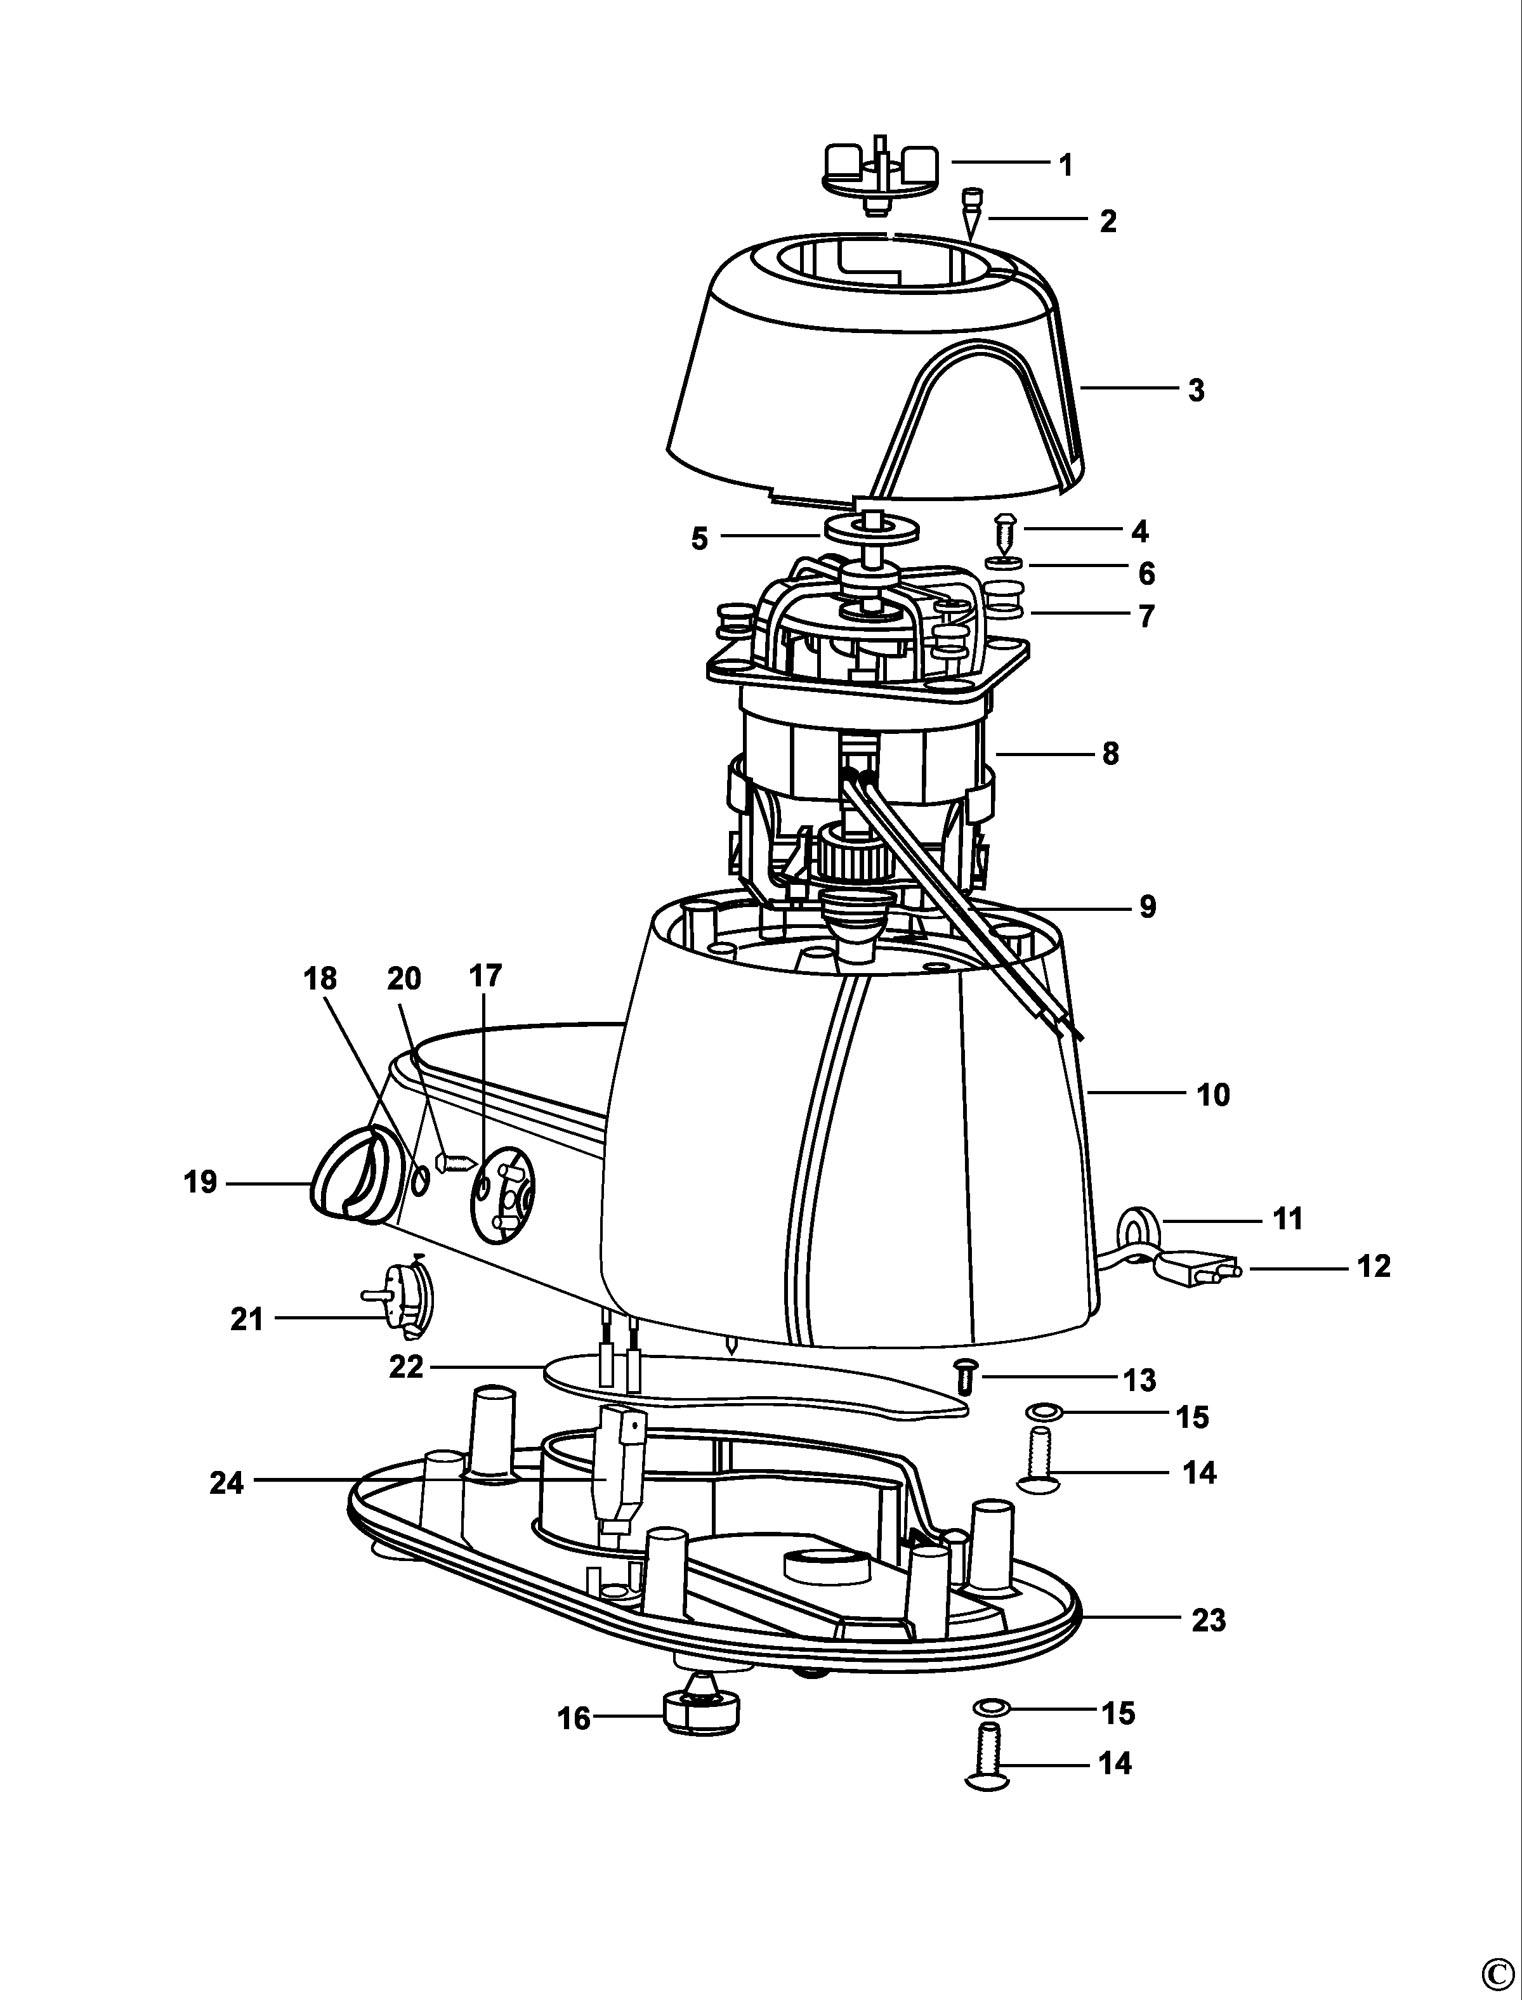 Spares for Black & Decker Fg550 Mixer Grinder (type 1